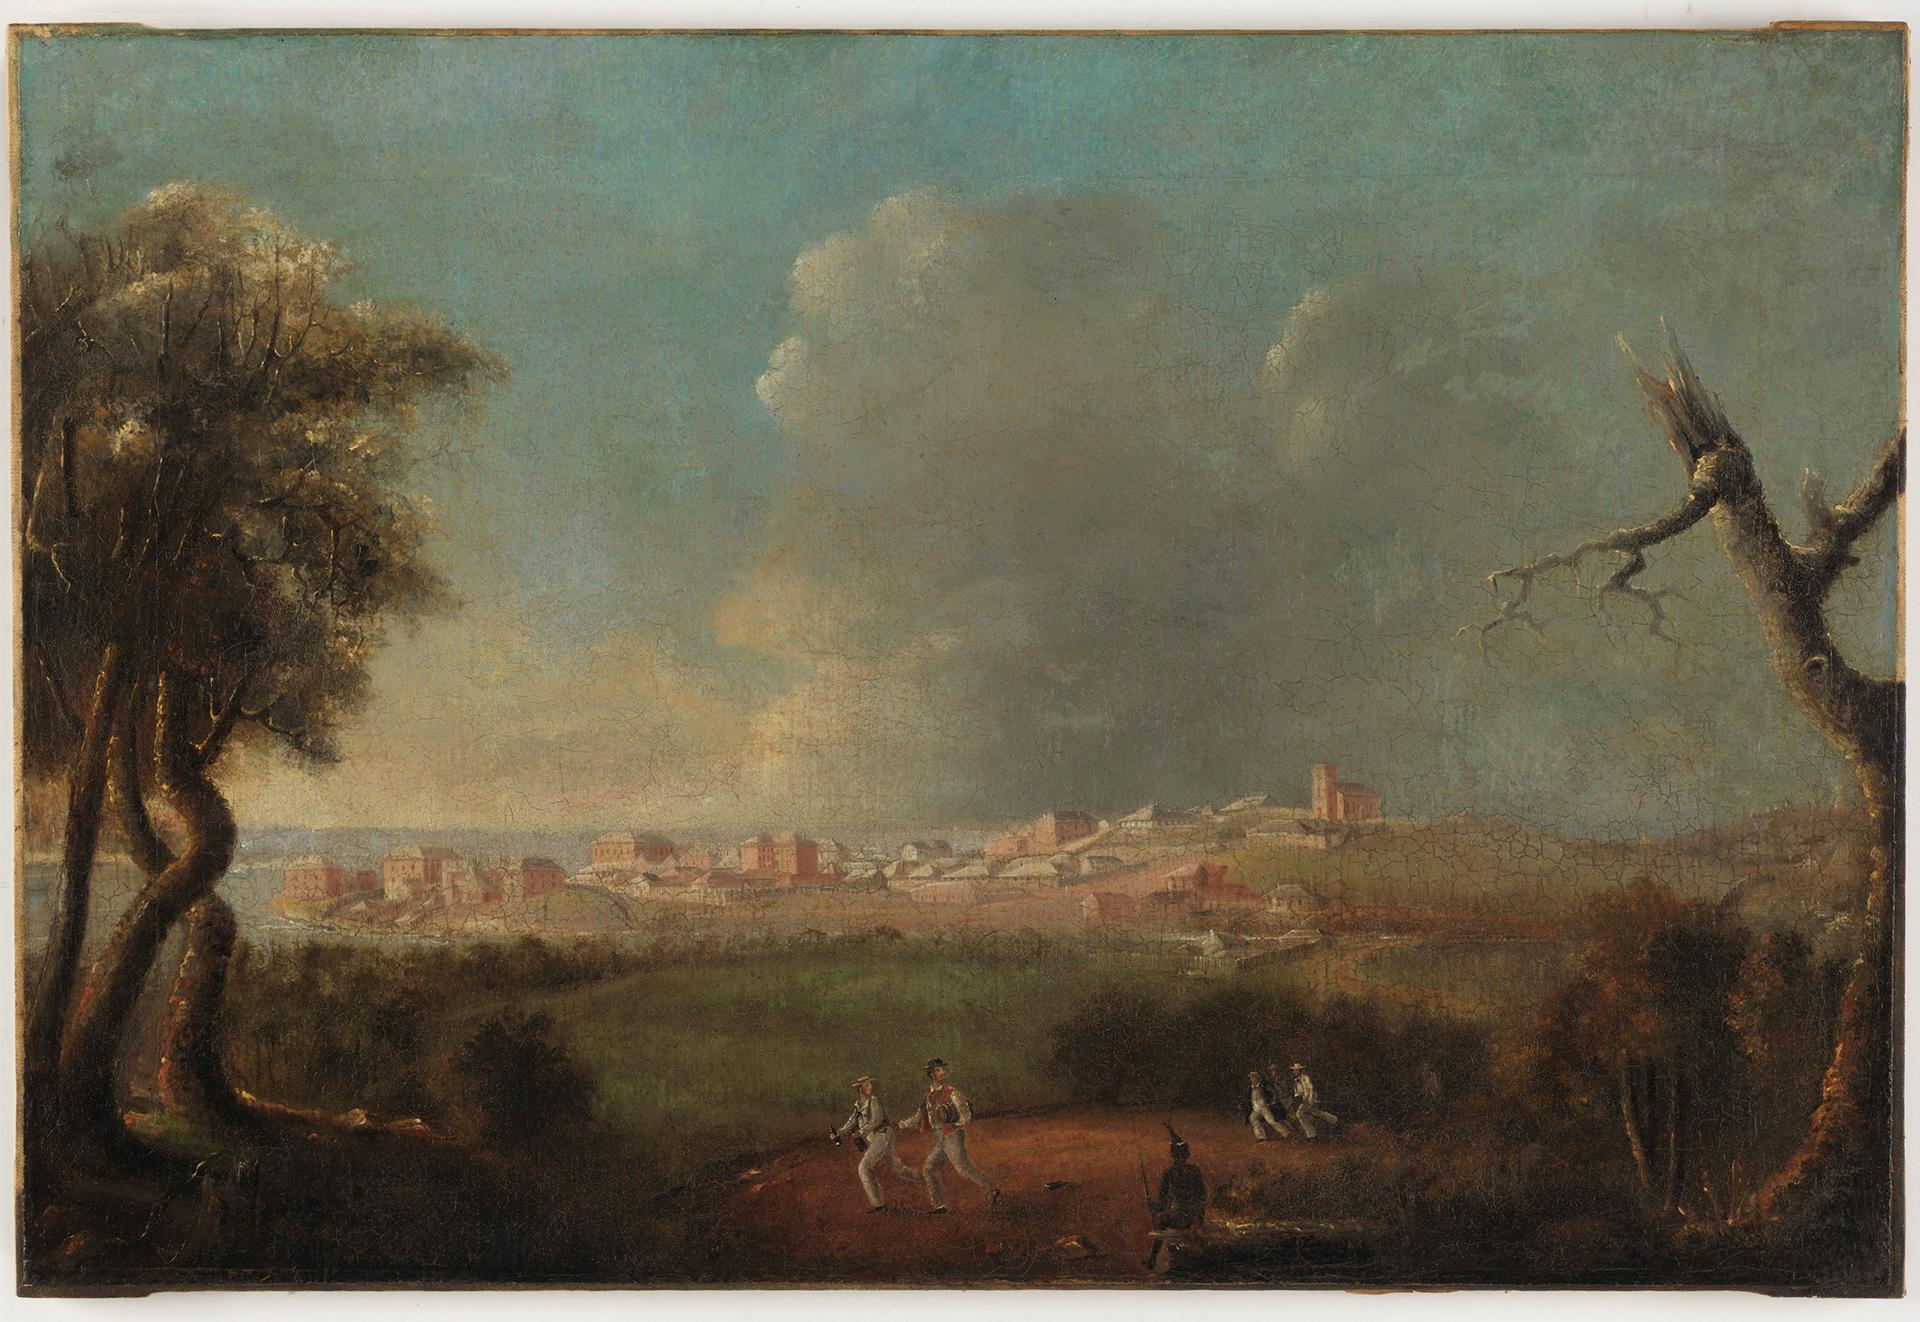 Port Macquarie, 1833? / probably by J. Backler